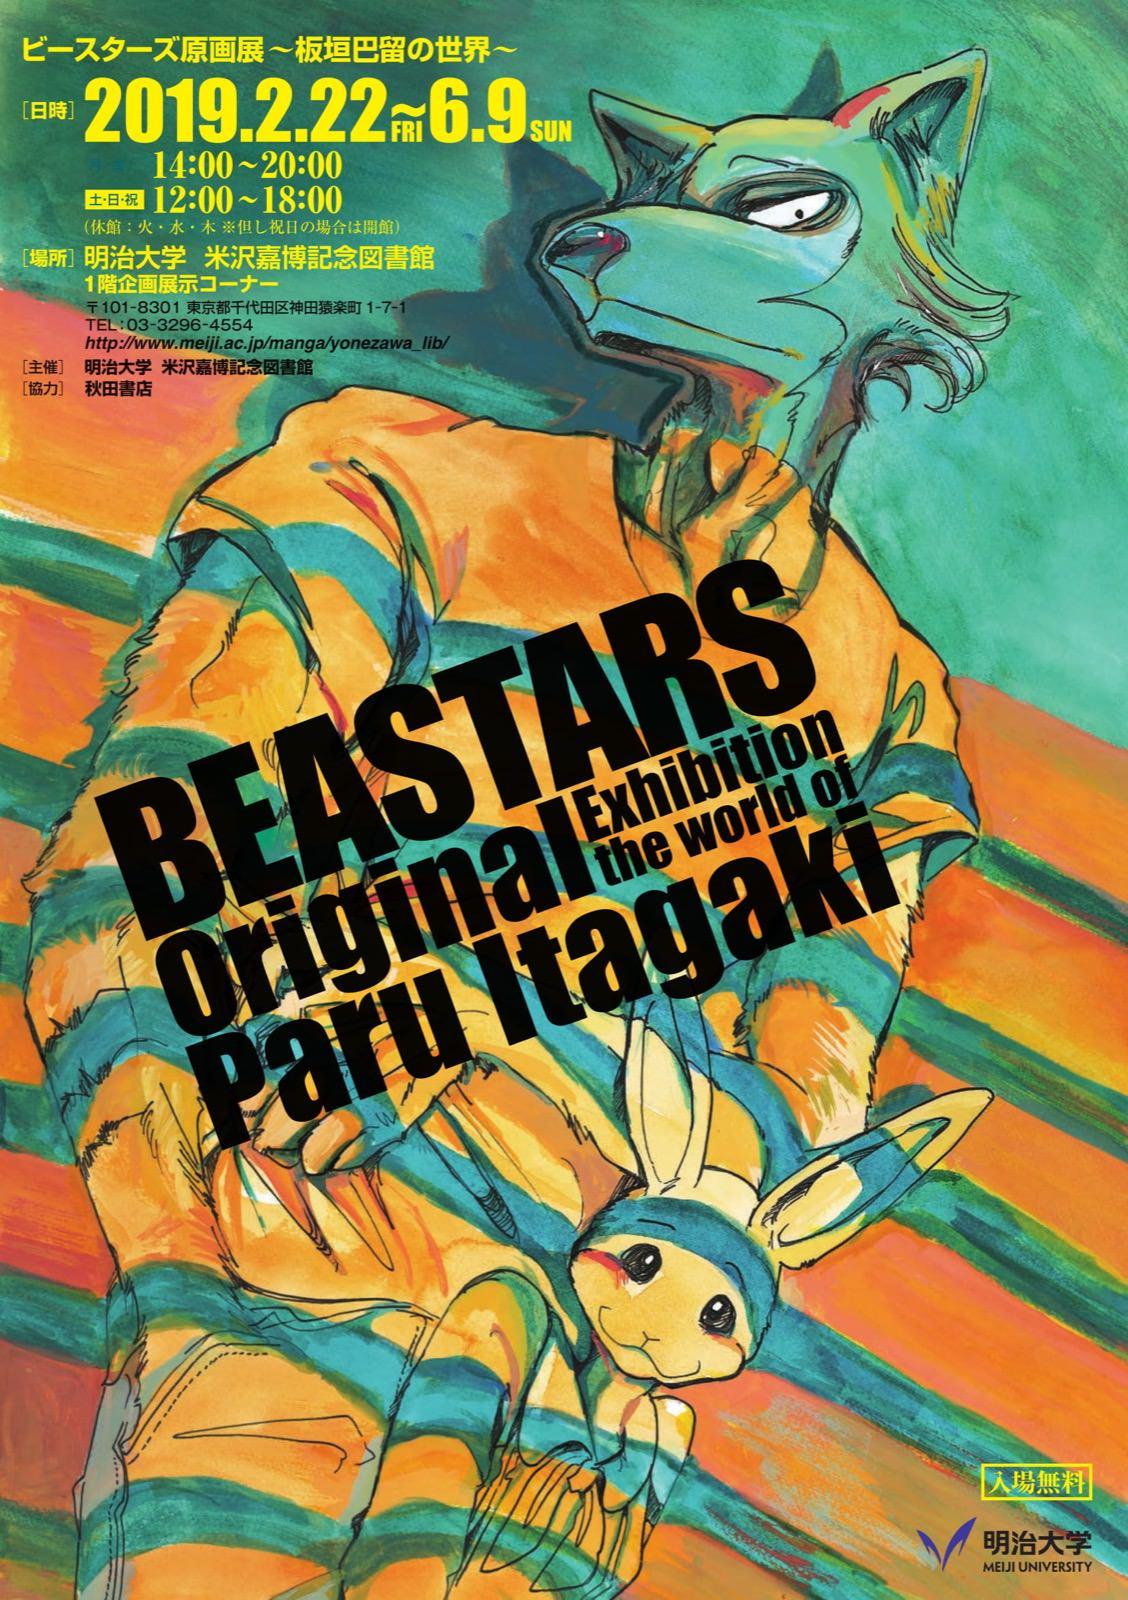 BEASTARS ビースターズ原画展 -板垣巴留の世界- 2019.2.22〜6.9 開催!!